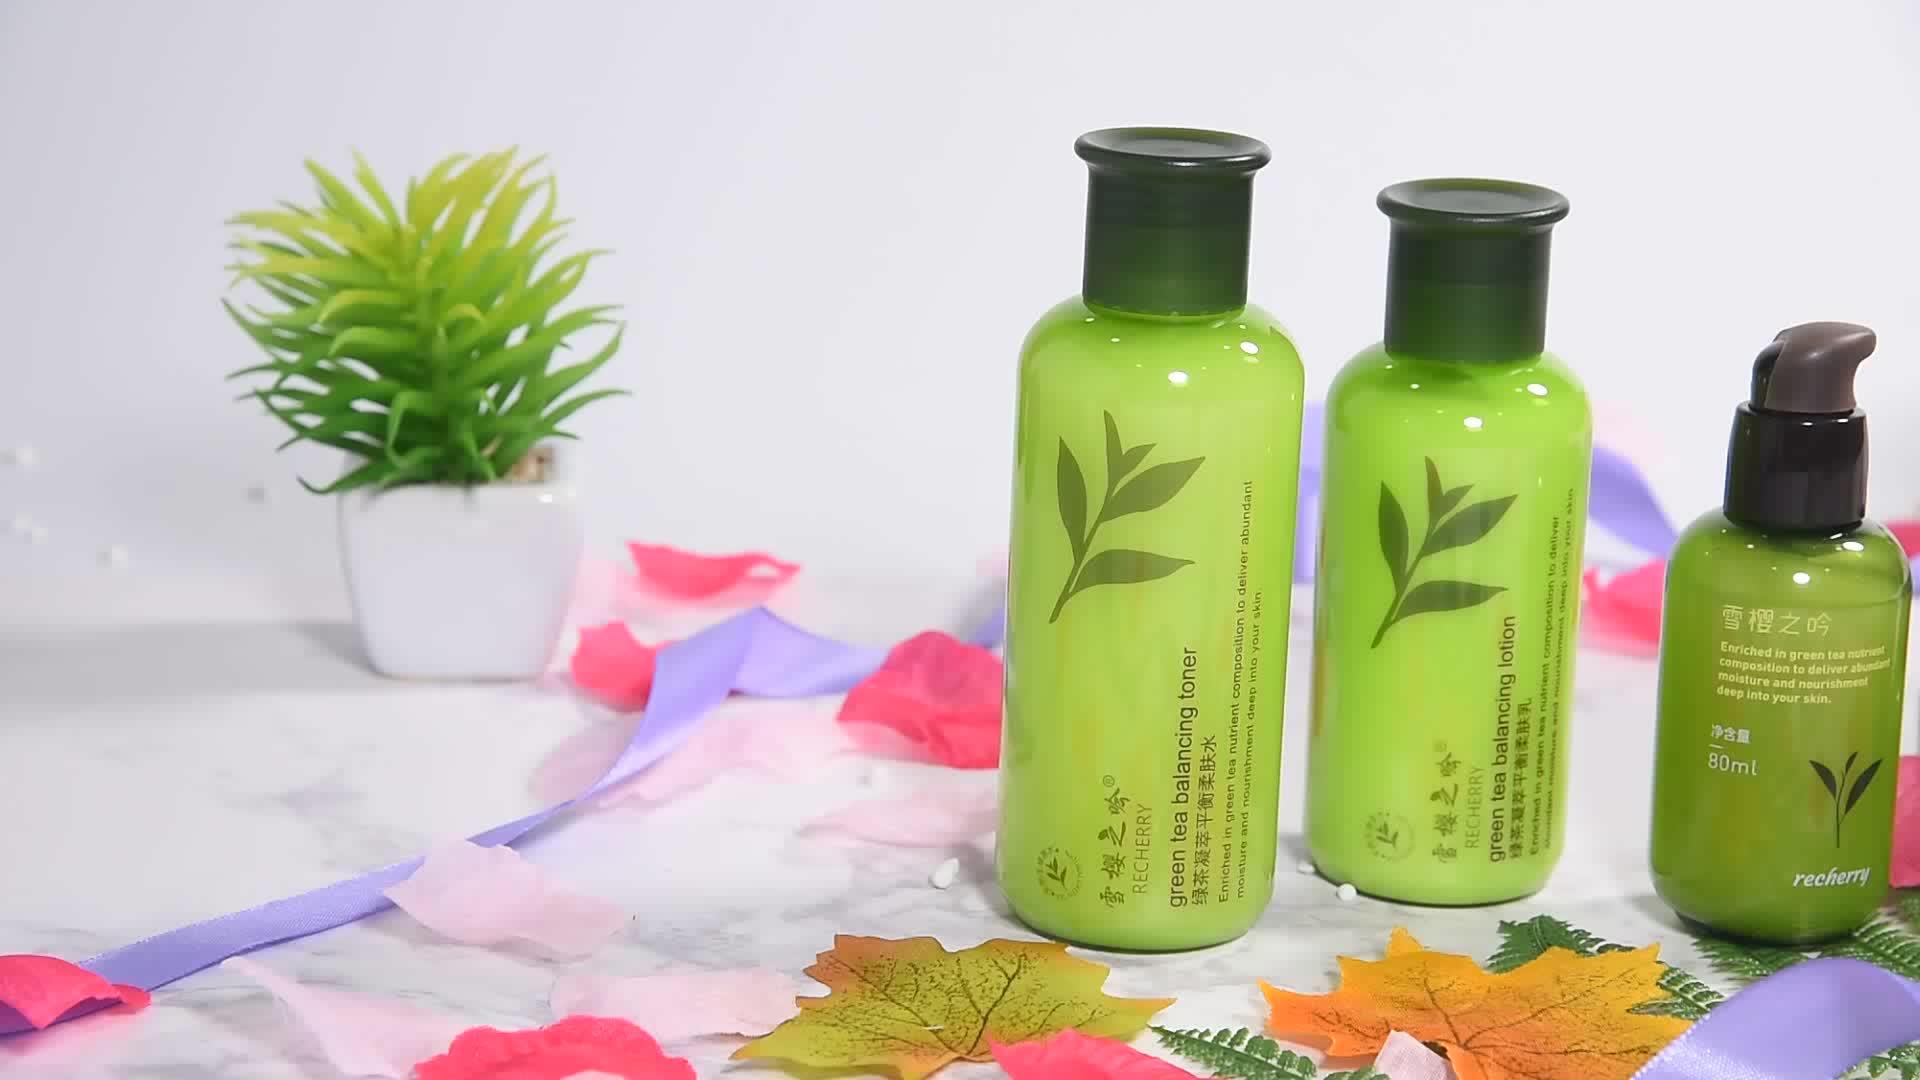 OEM ODM natural skin care toner  shrink pores restore skin to water and oil balance balancing toner